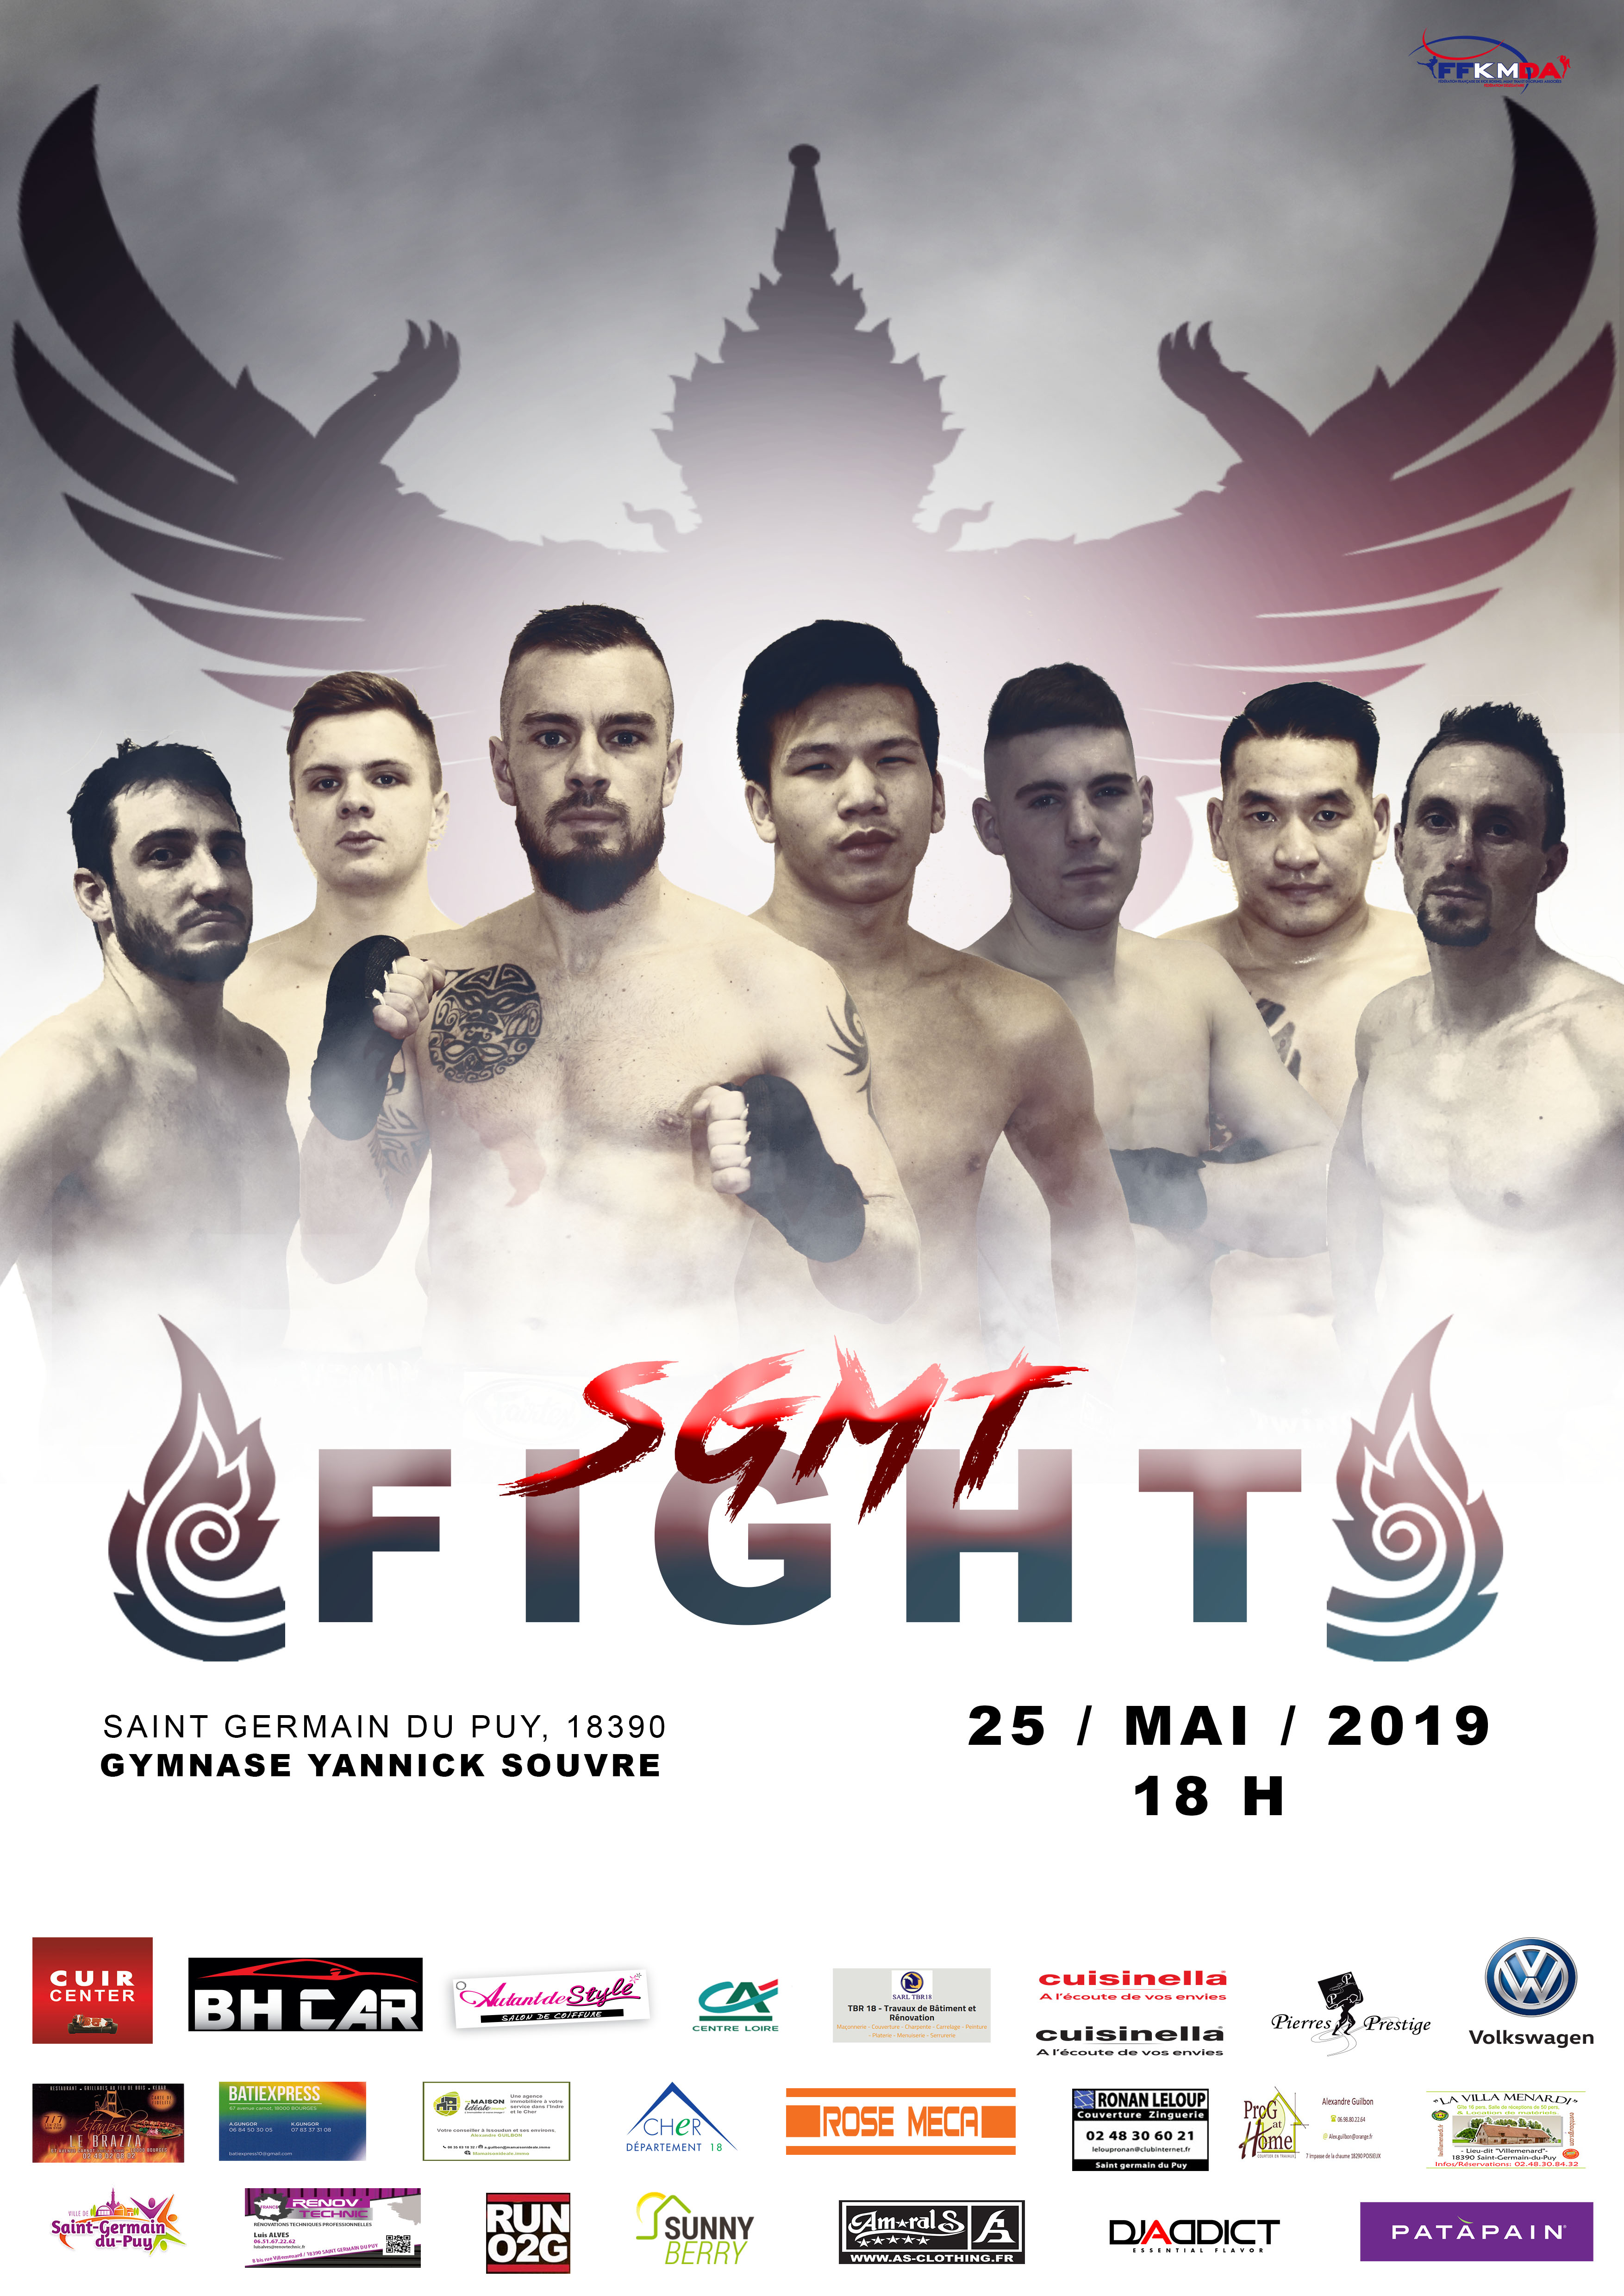 sgmt_fight_2